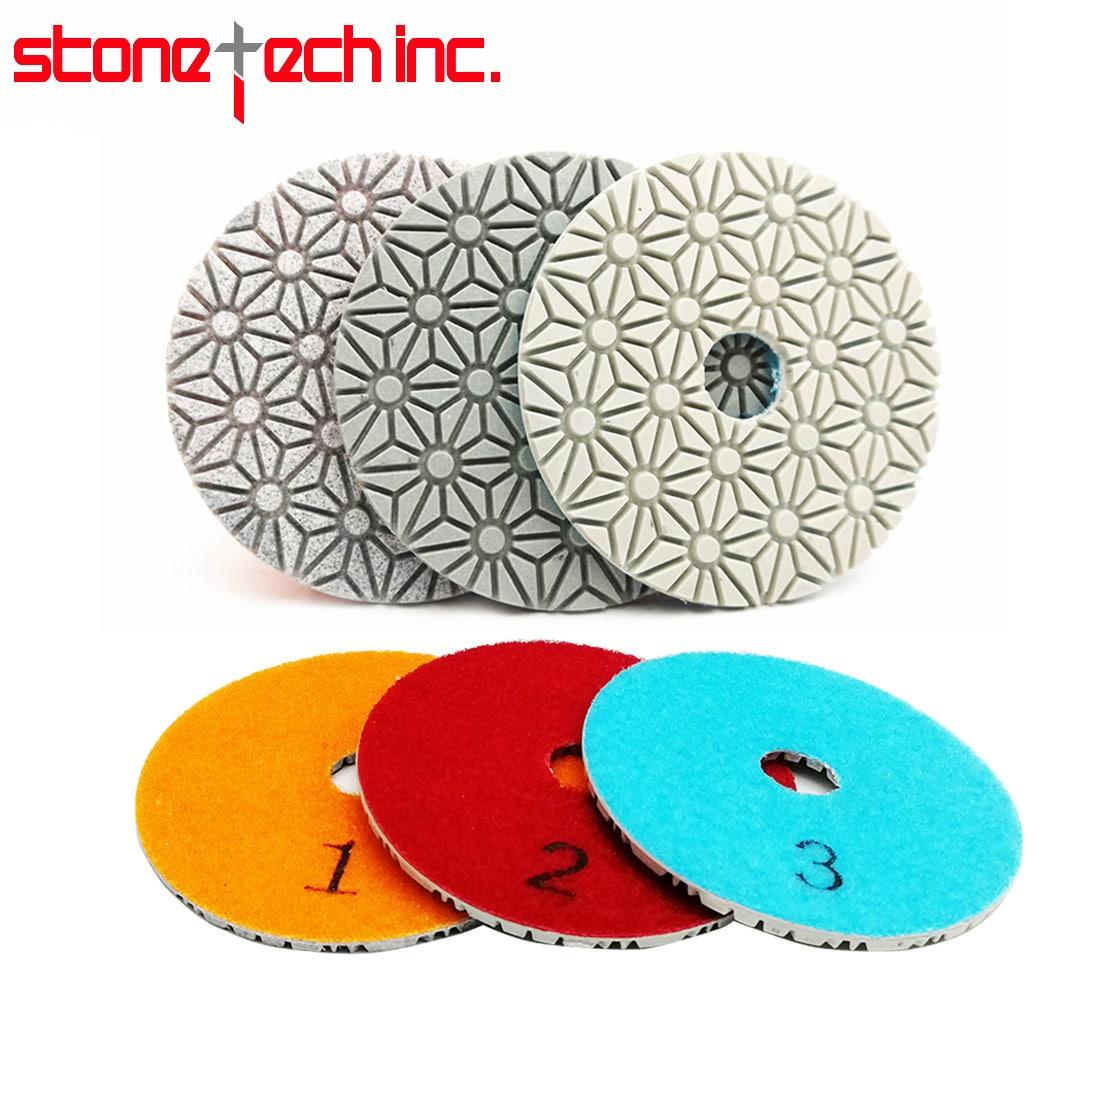 "Diamond Polishing Pads Flexible Resin Bond Sanding Discs Marble Stone Polisher Disc | 2sets/6pcs Dia 100mm/4"" 3 Steps"